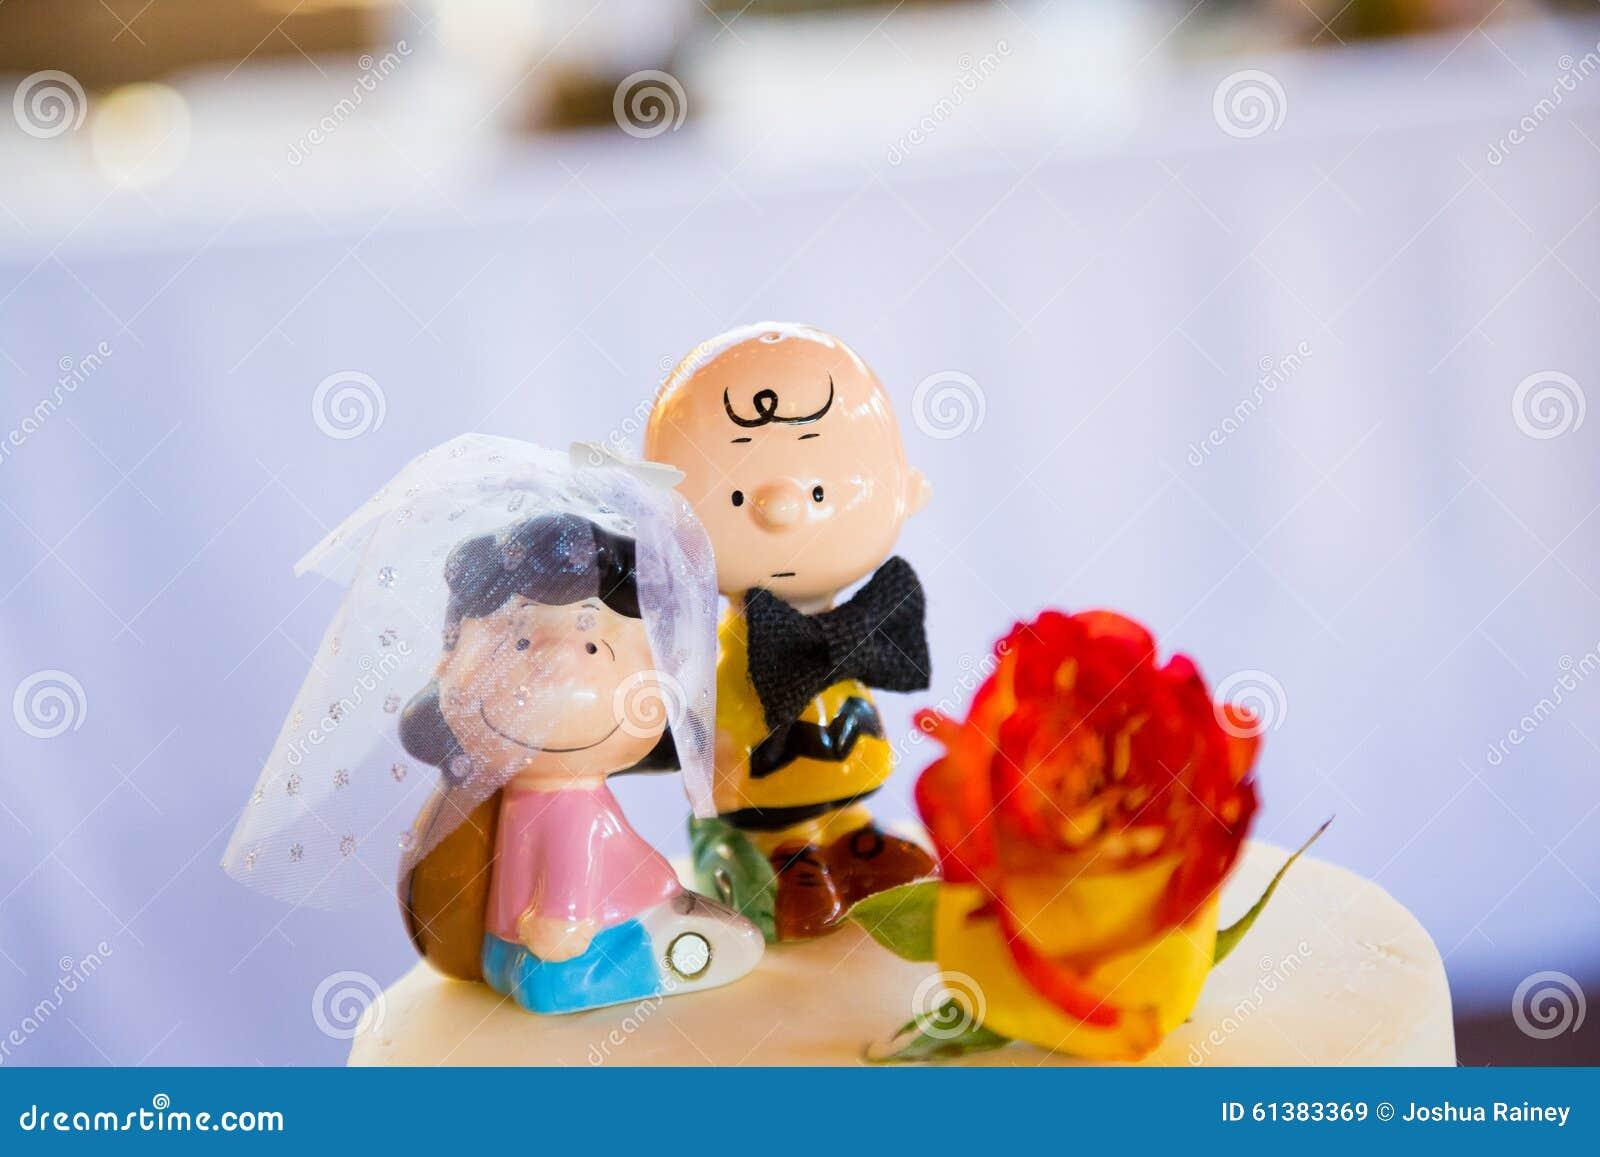 Charlie Brown Wedding Cake Topper